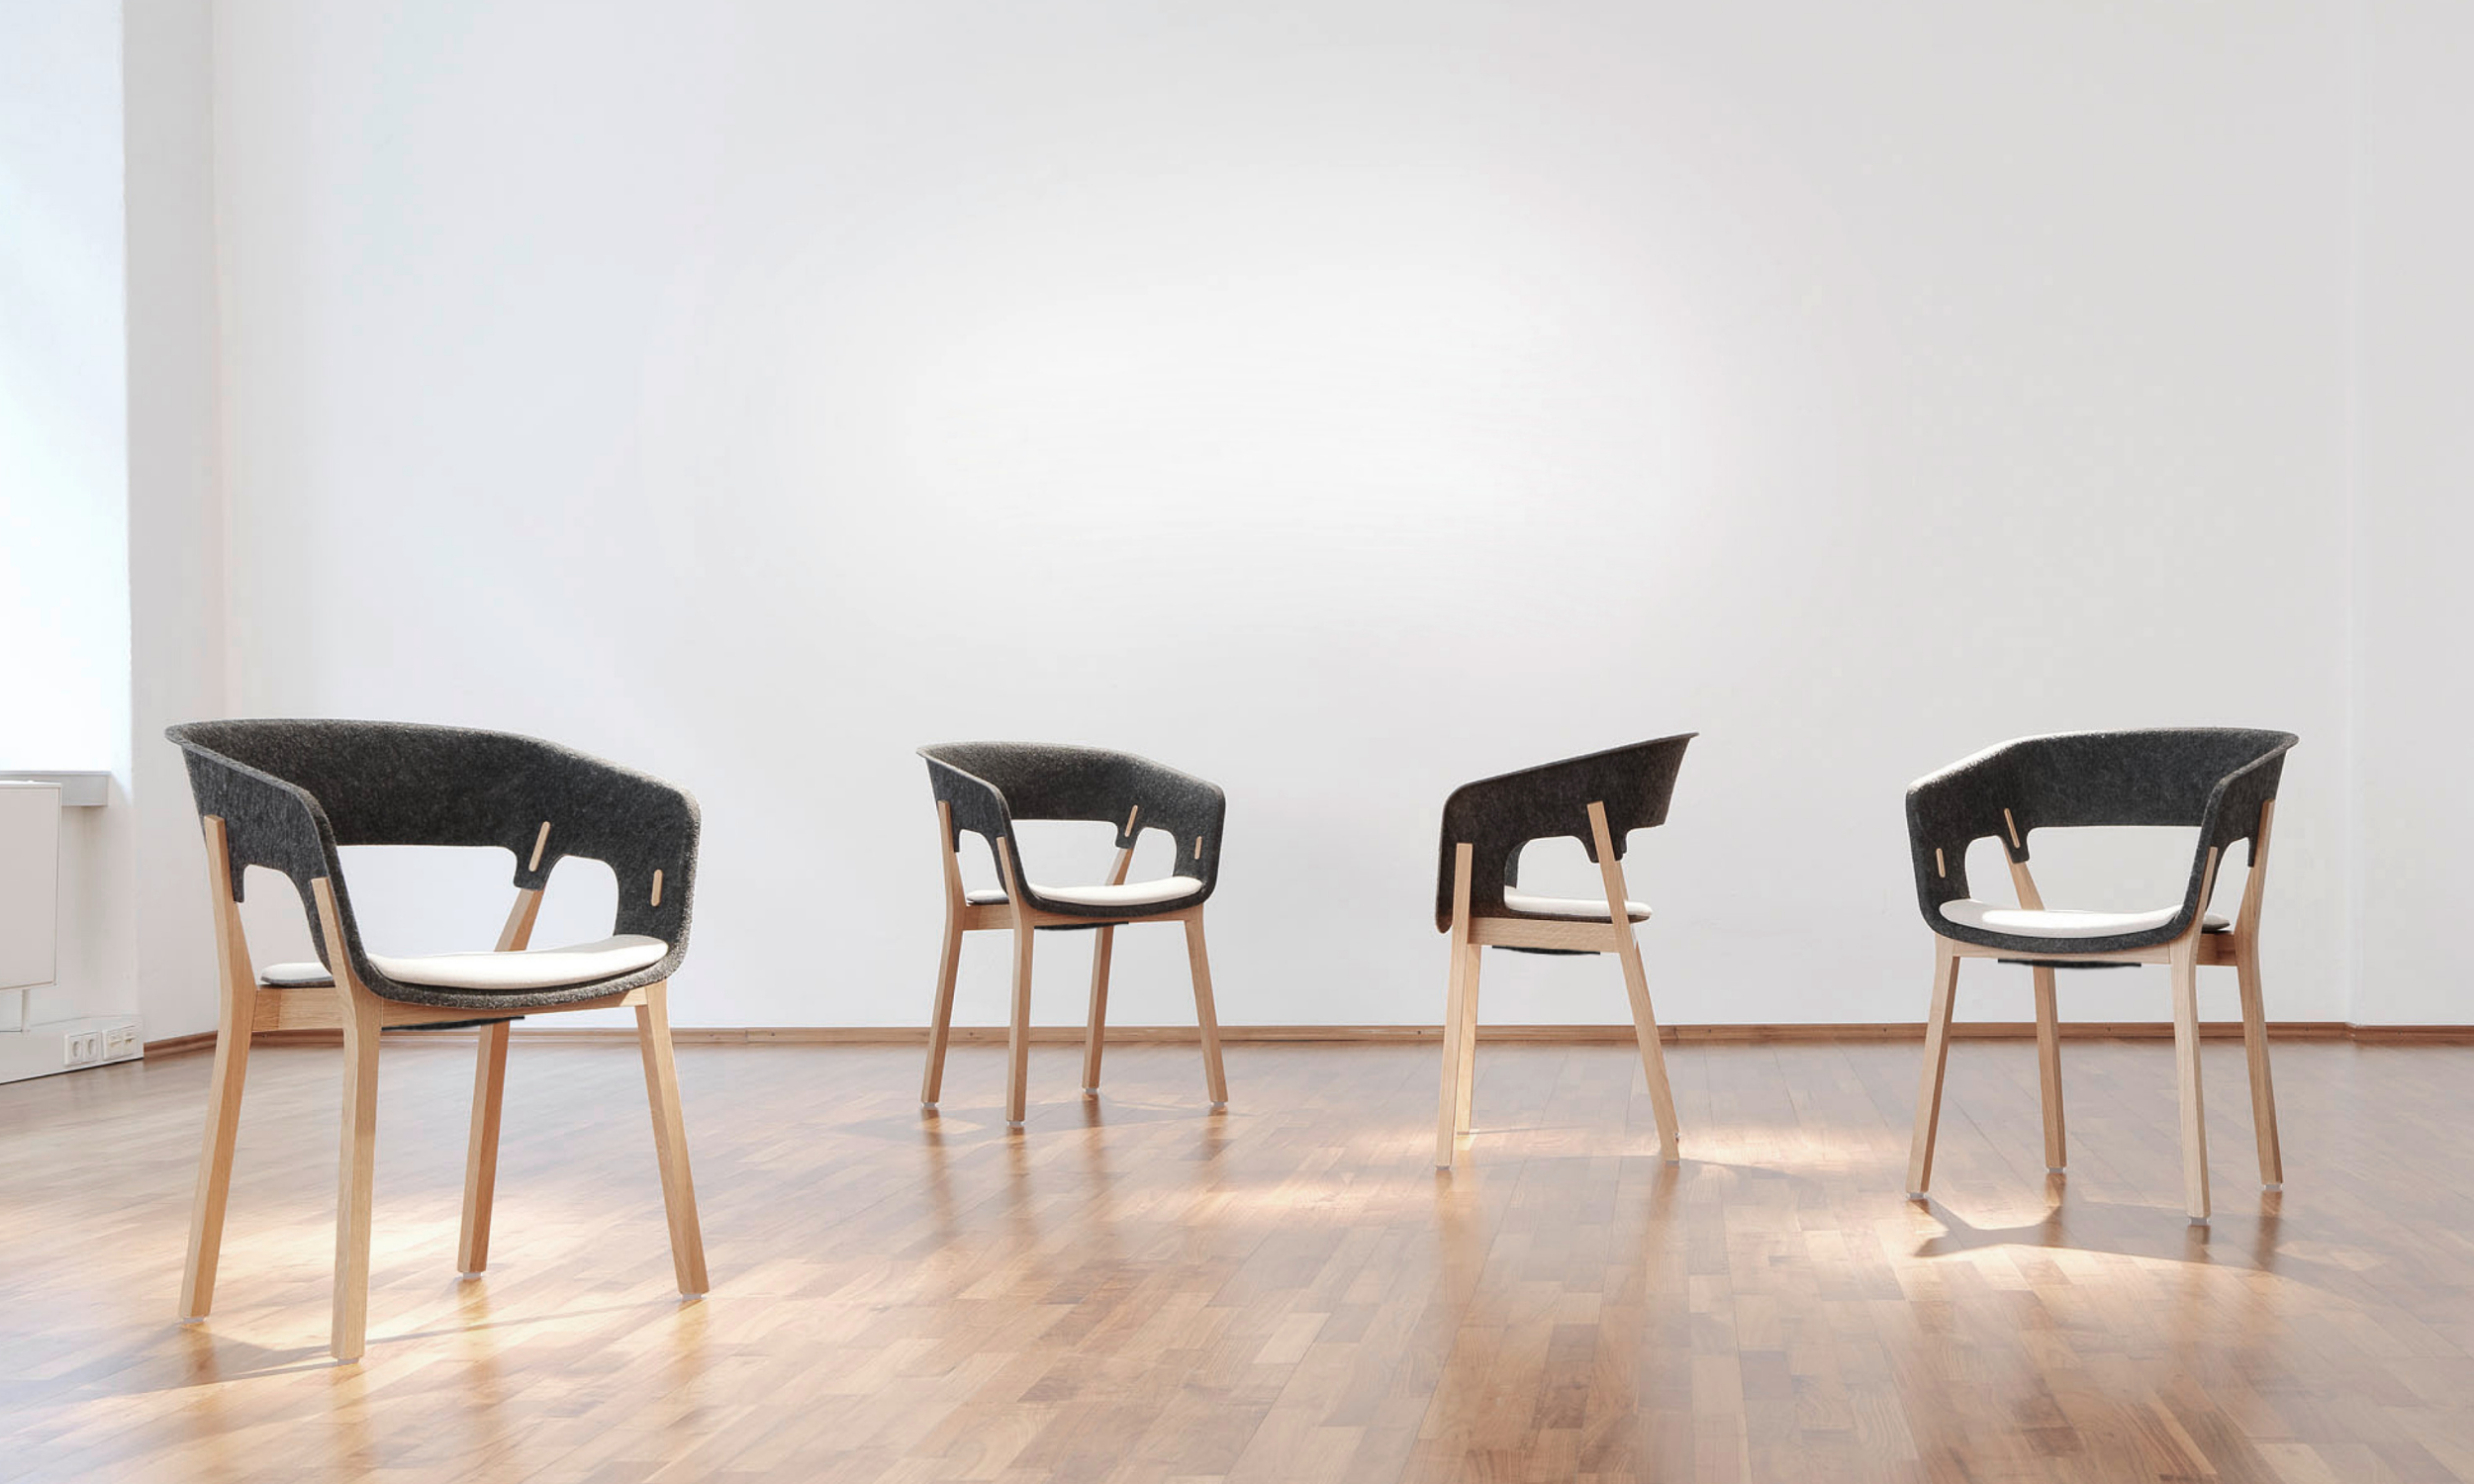 office-chairs_10-6_Club-1.jpg